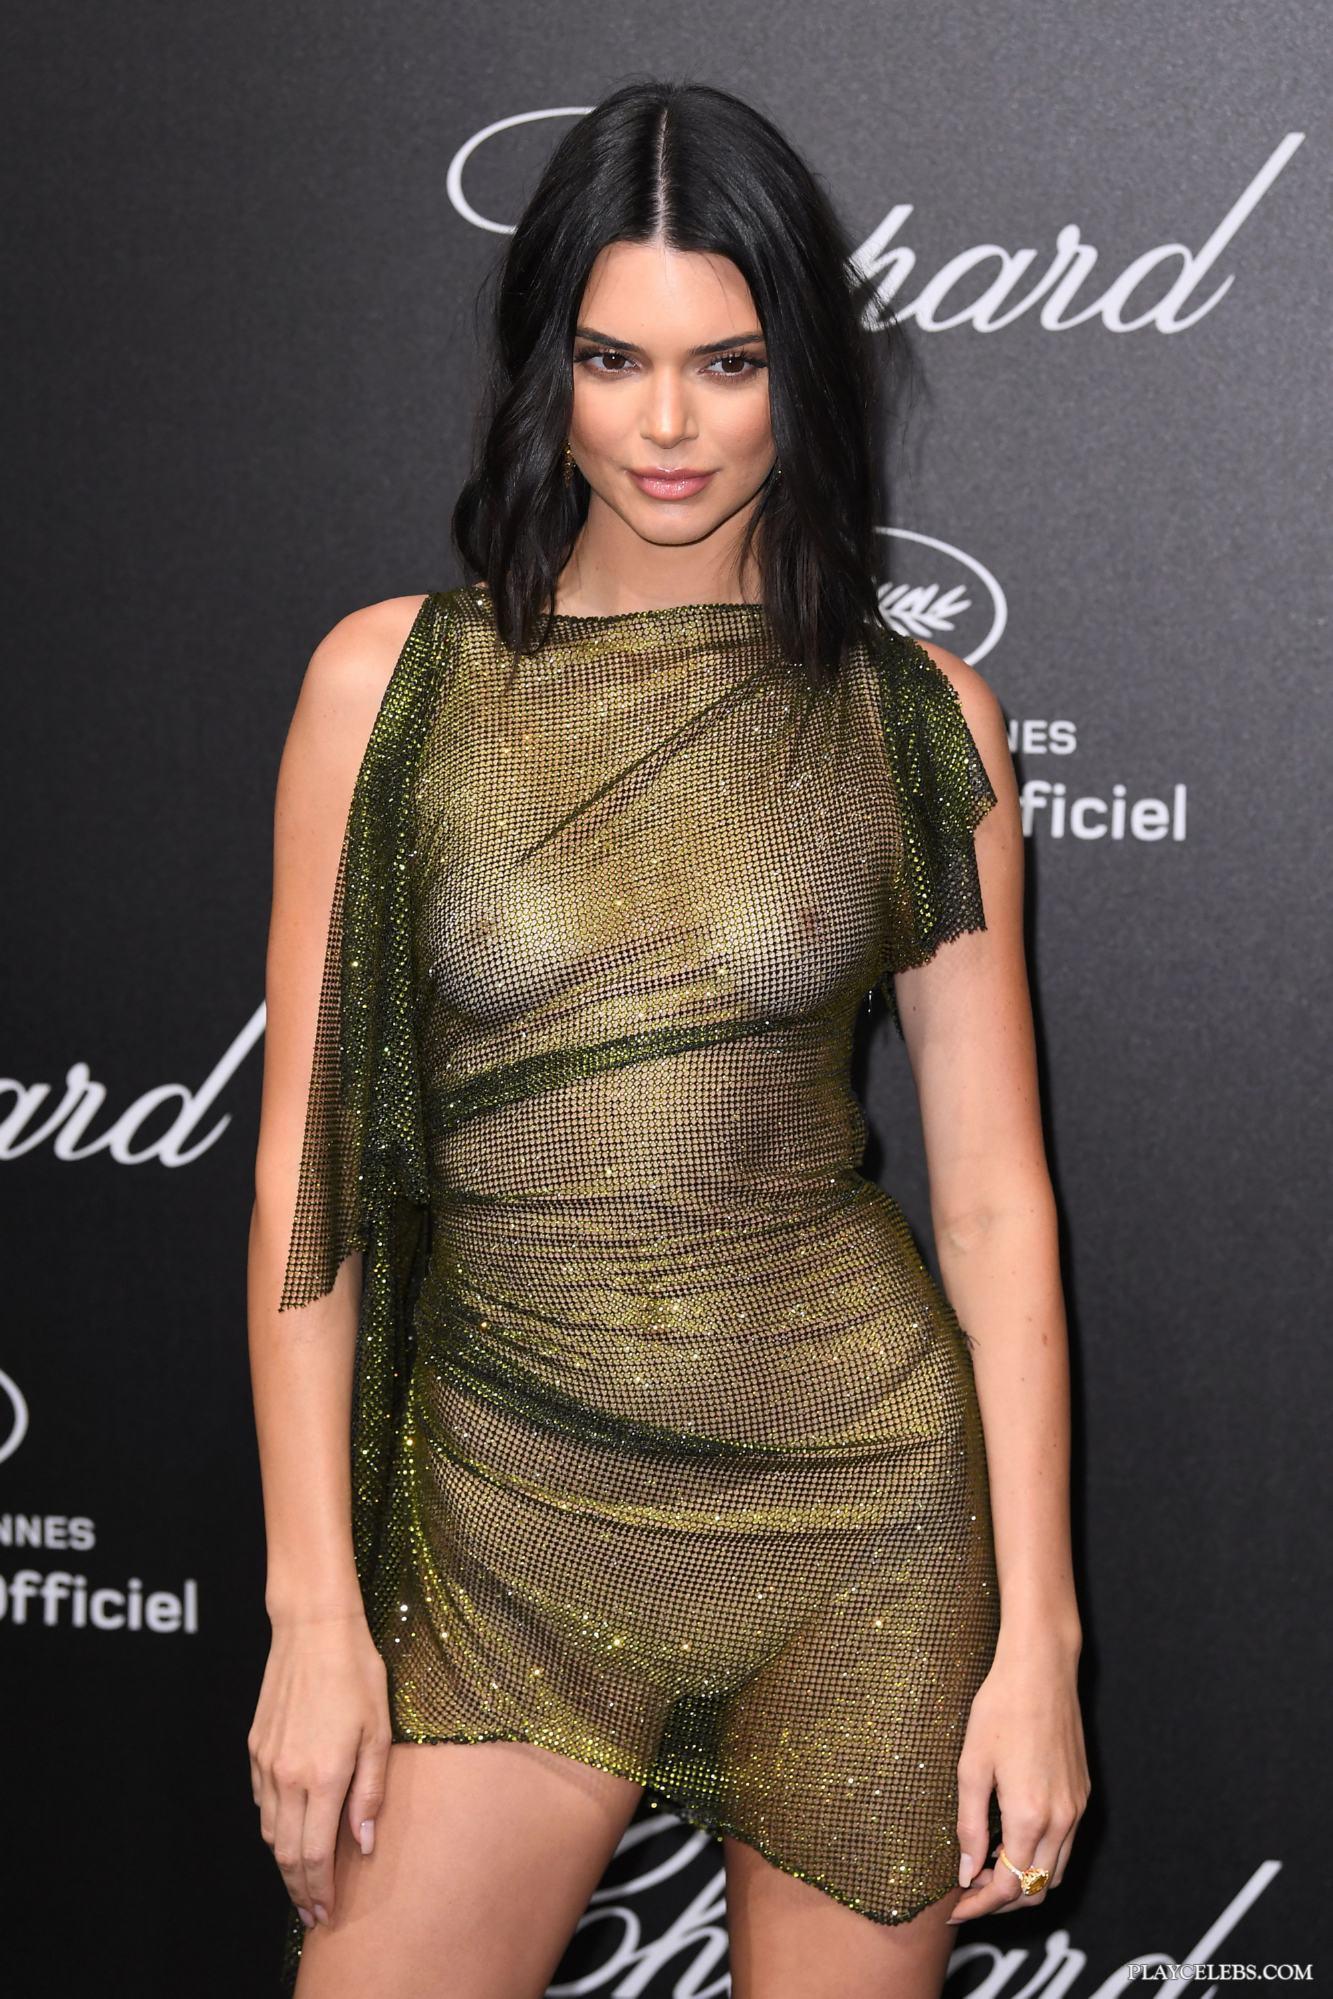 Kendall Jenner See Through & Bikini Ass Photos